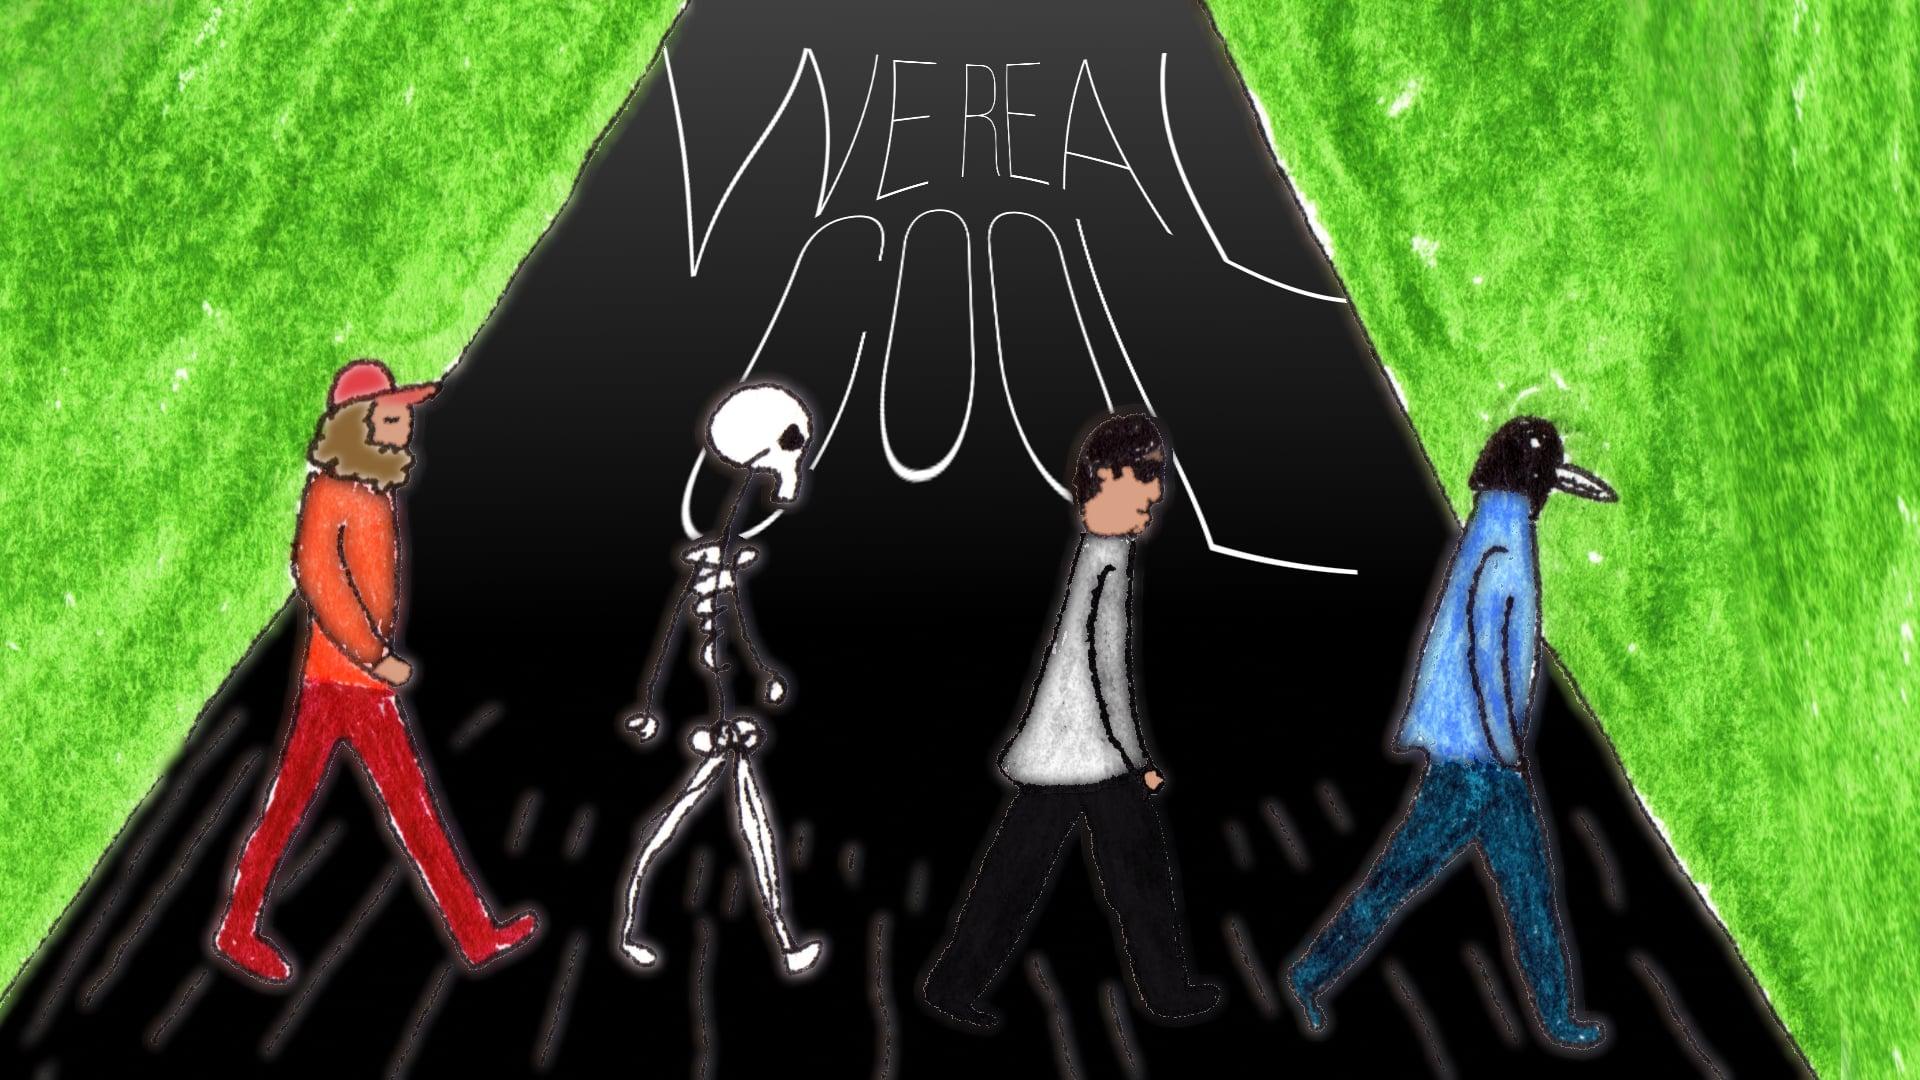 We Real Cool (Short Film)